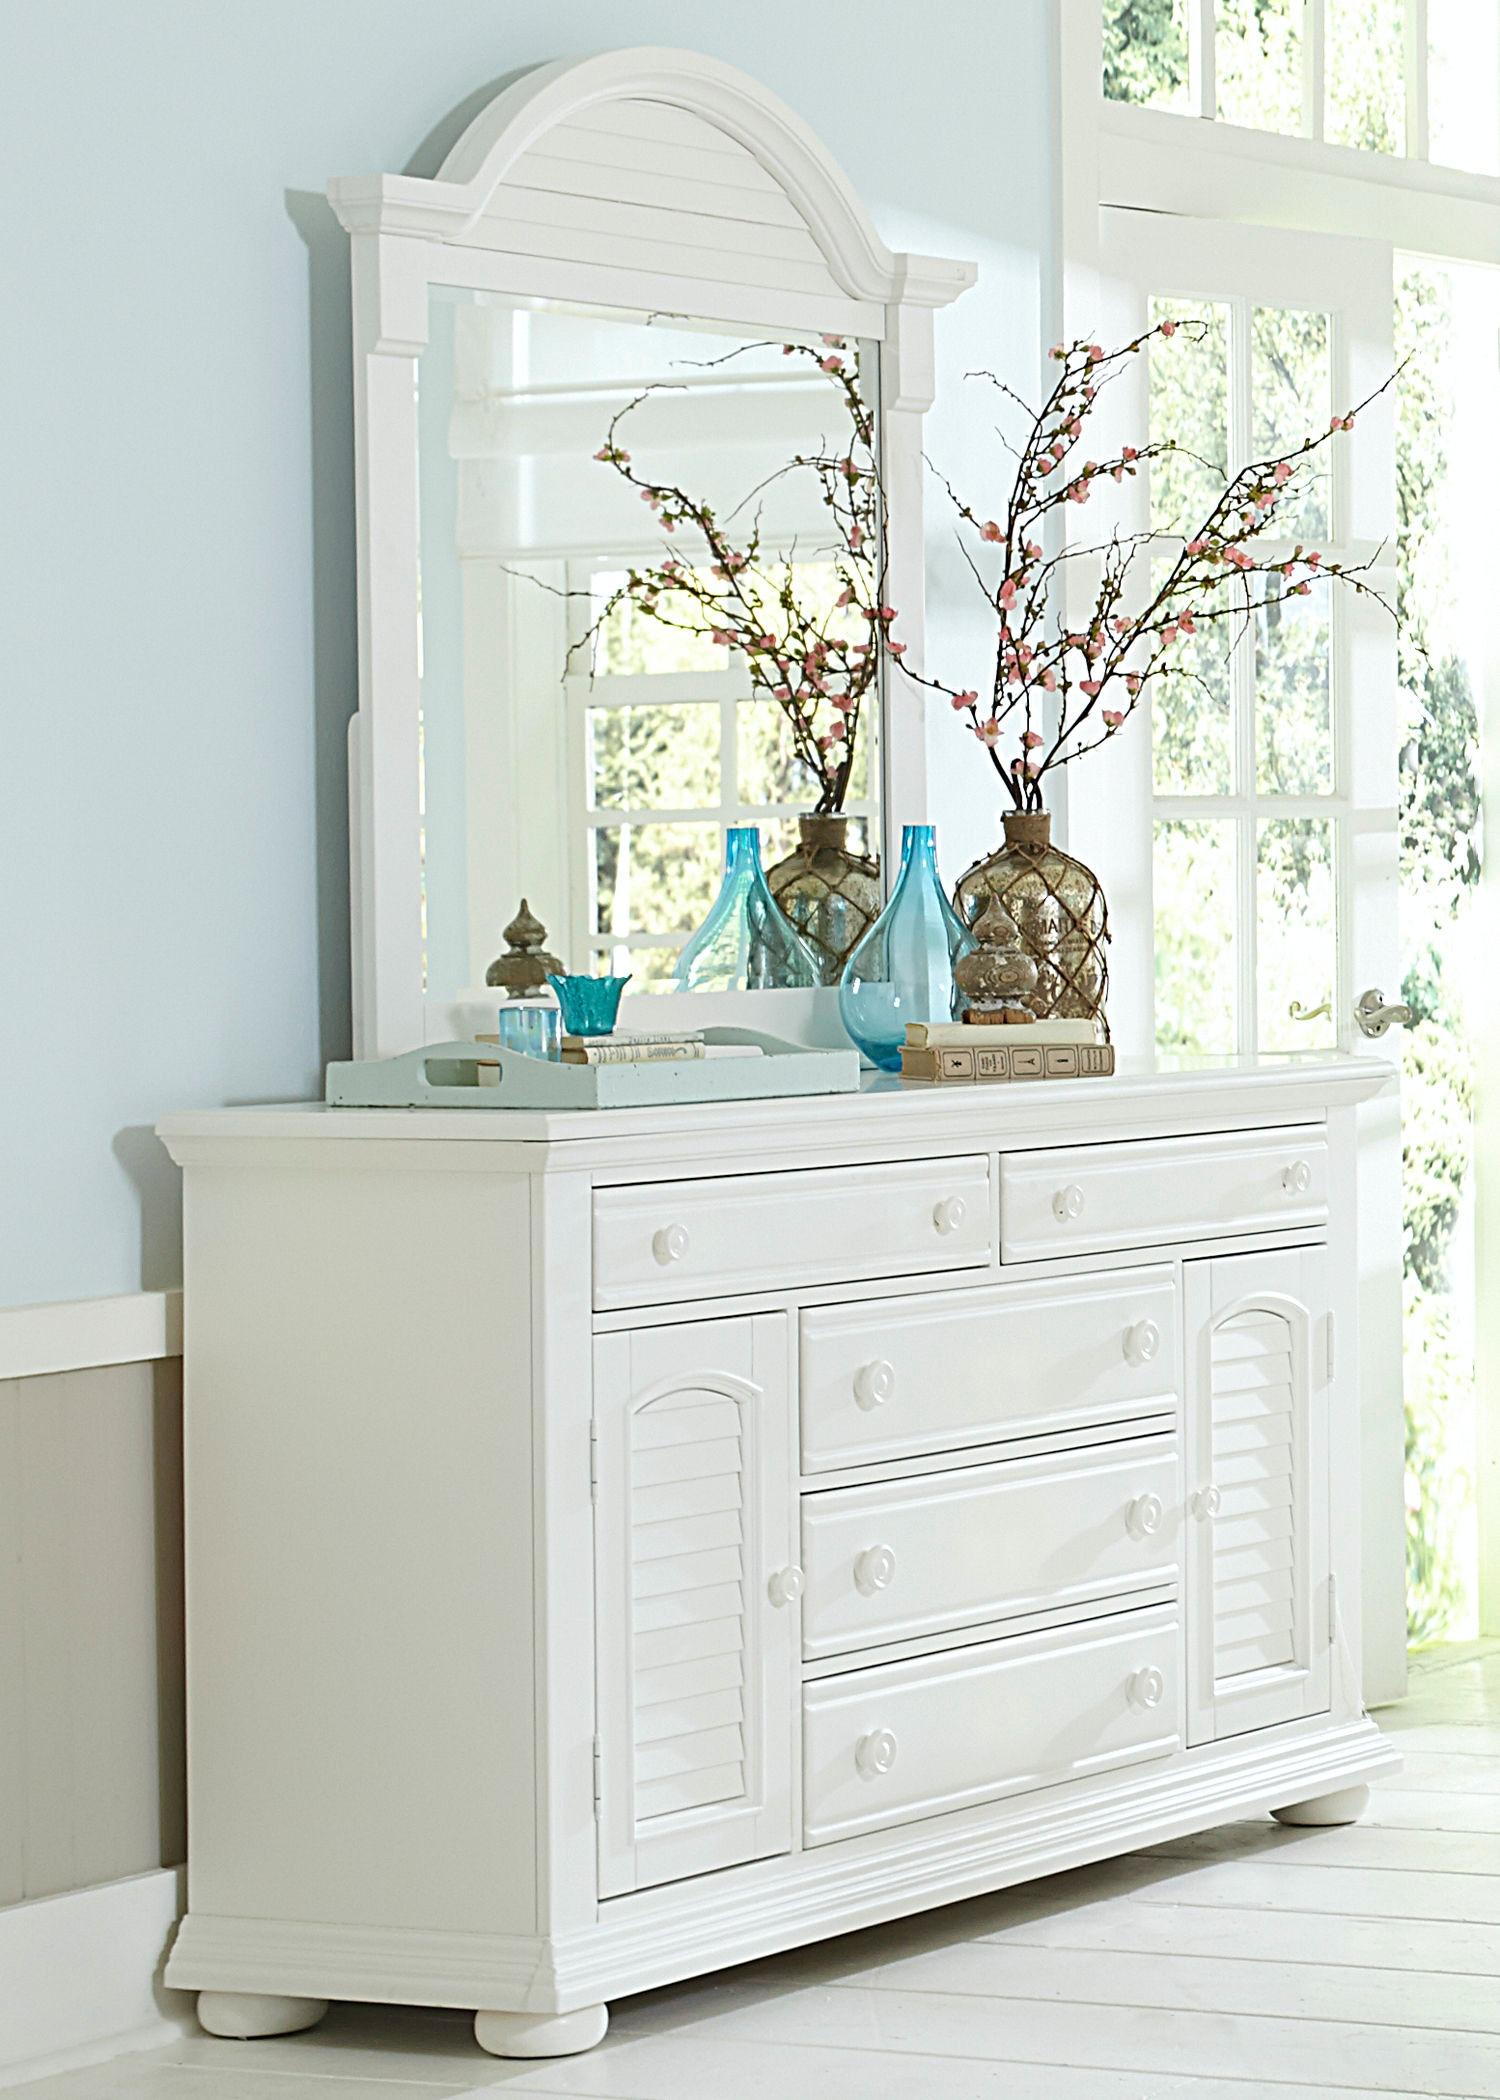 Liberty Furniture Bedroom 2 Door 5 Drawer Dresser 607 BR32 At Waltman  Furniture